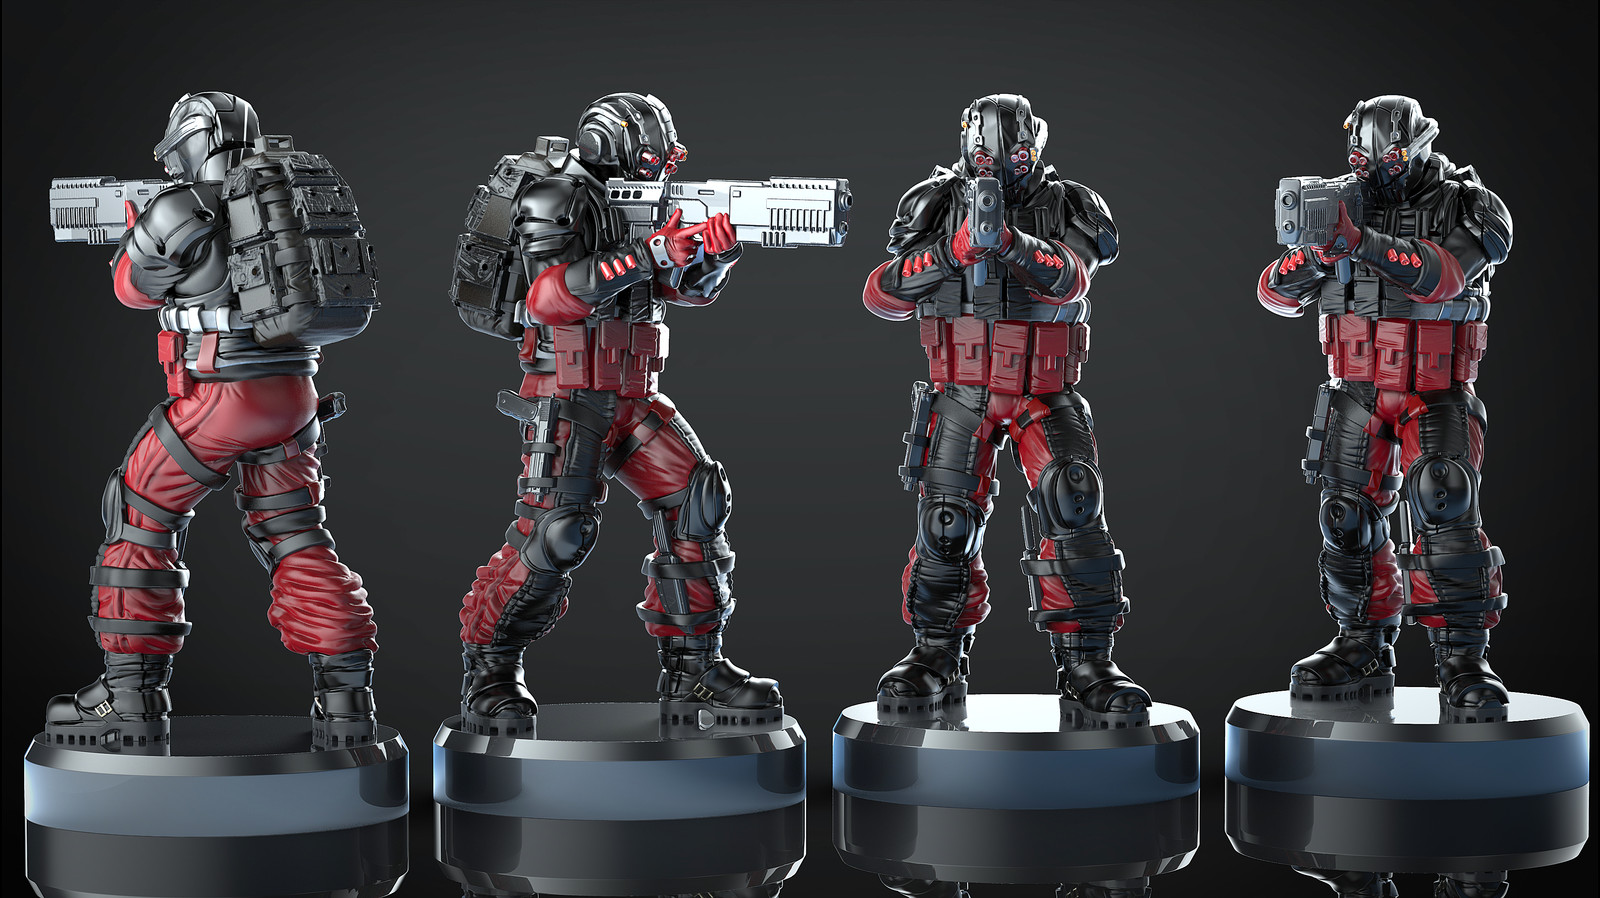 Sci-fi soldier wargame miniature